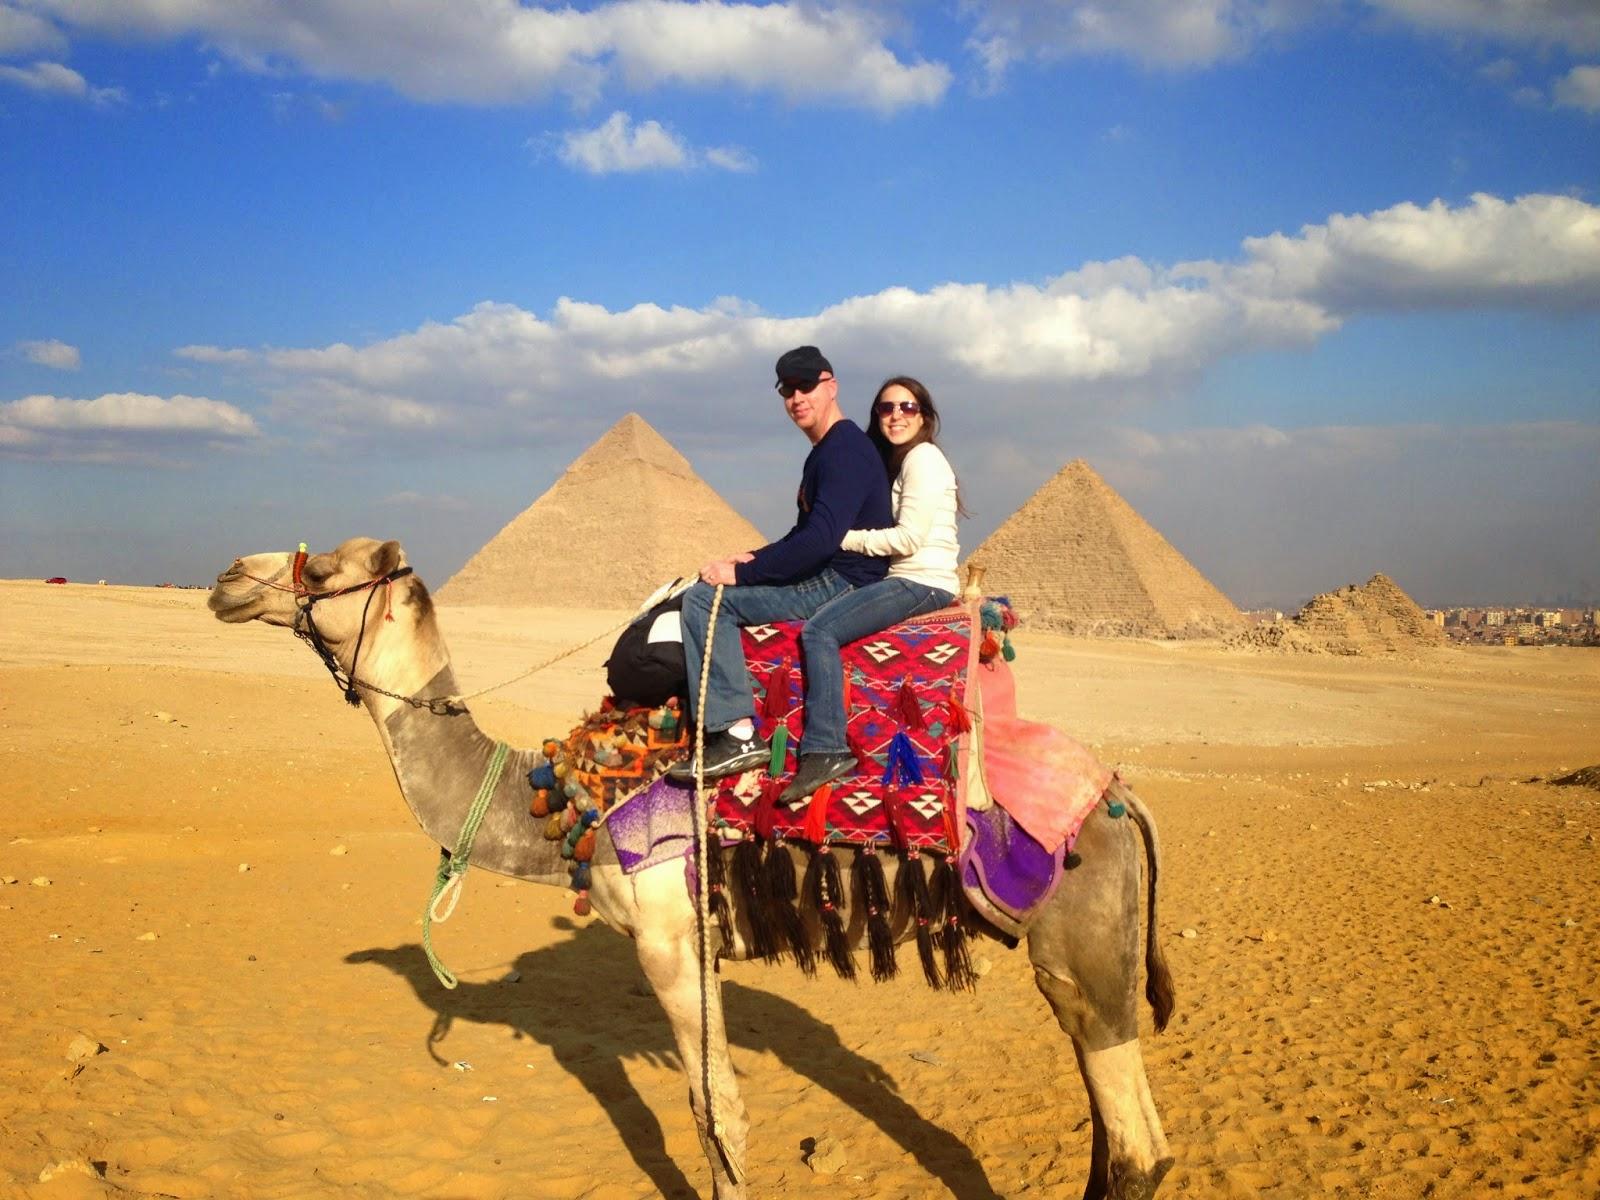 Great Pyramids of Giza camel ride